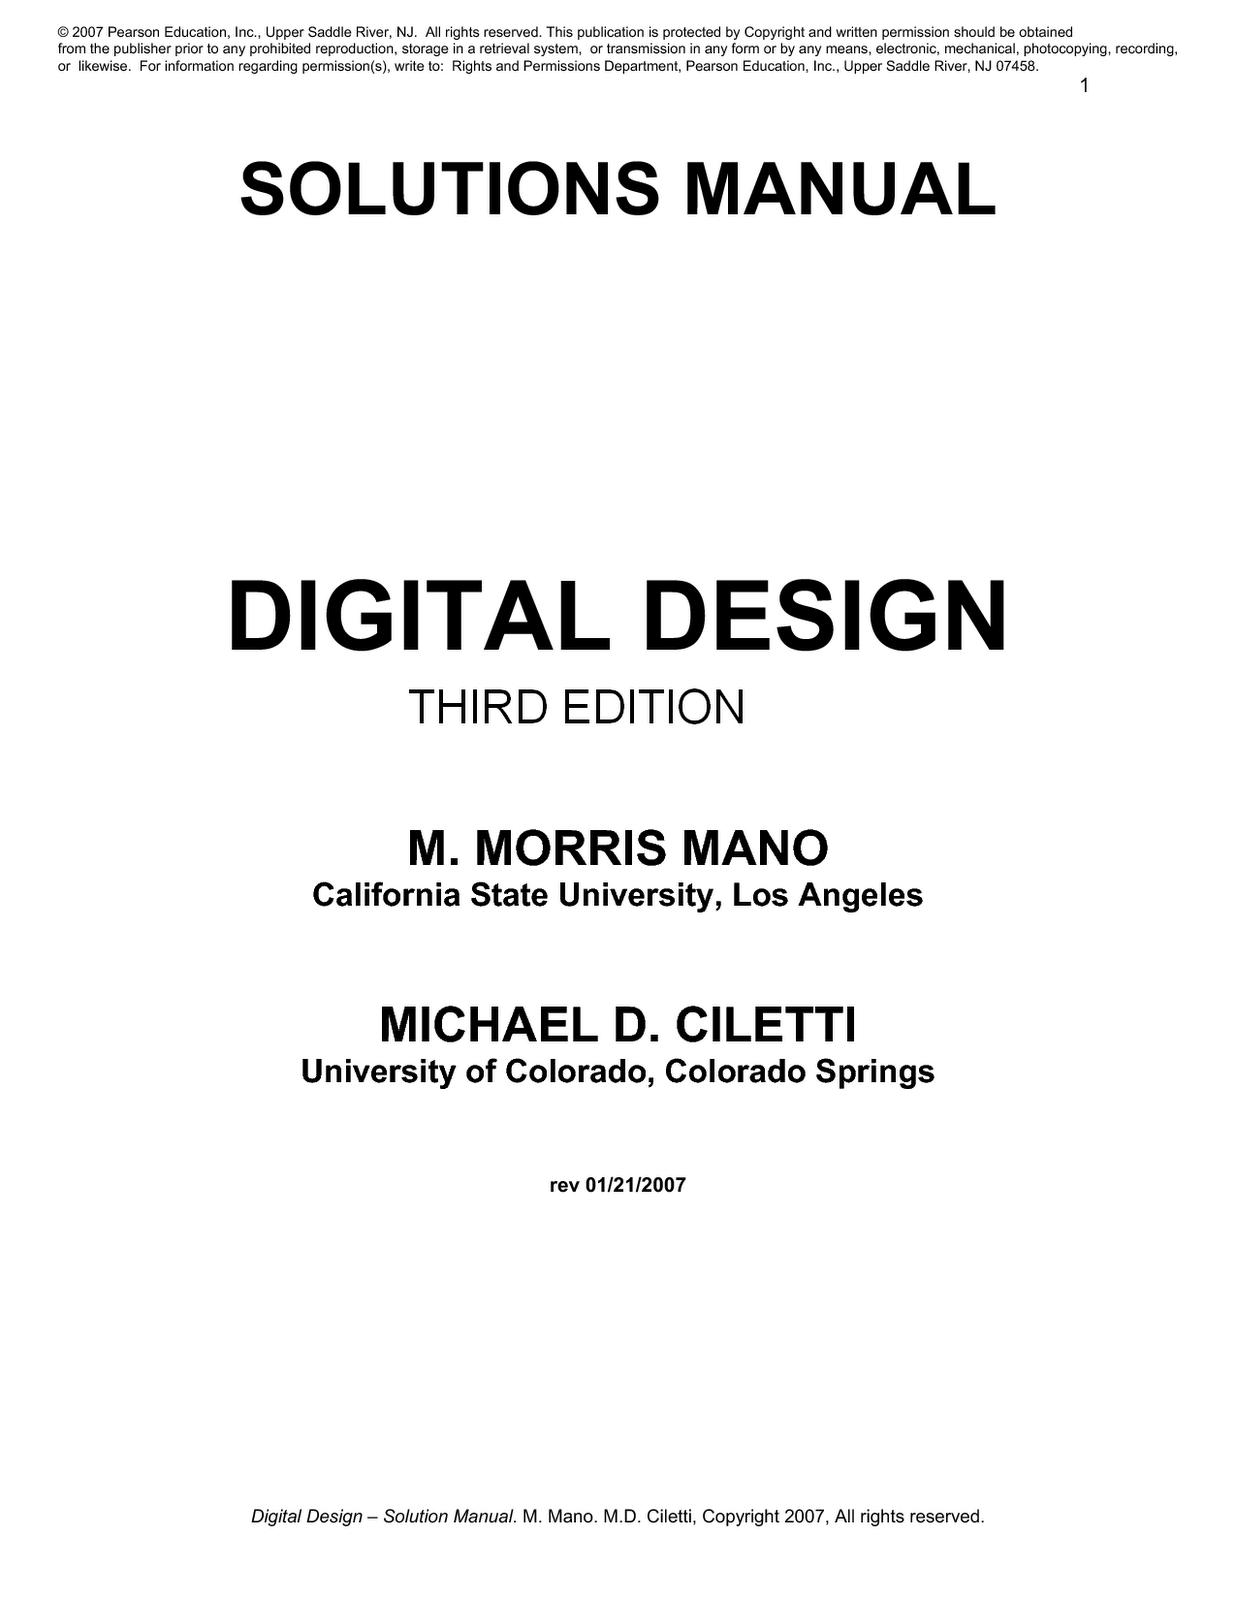 Digital Design by M. Morris Mano - 4th Edition - Solution Manual